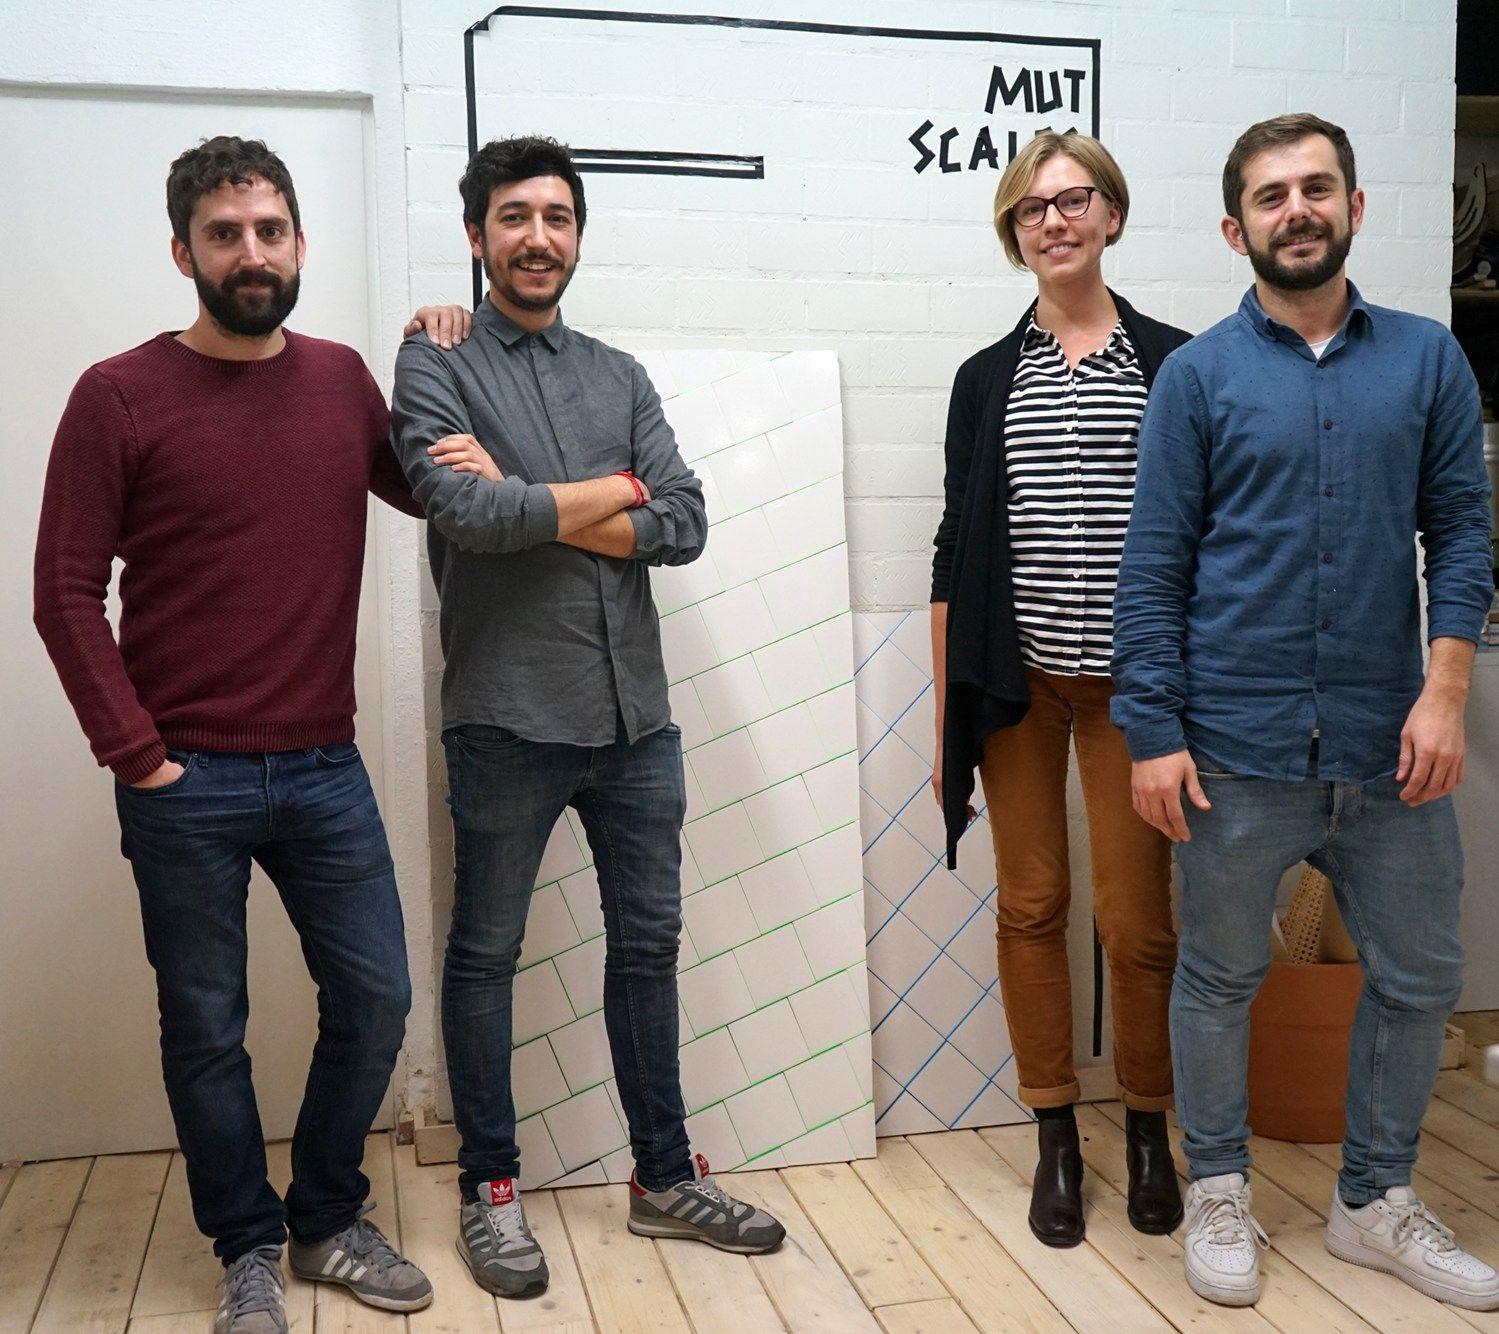 Manuel Martin, Eduardo Villalon, Emilija Cizeika, Alberto Sánchez © Archiproducts